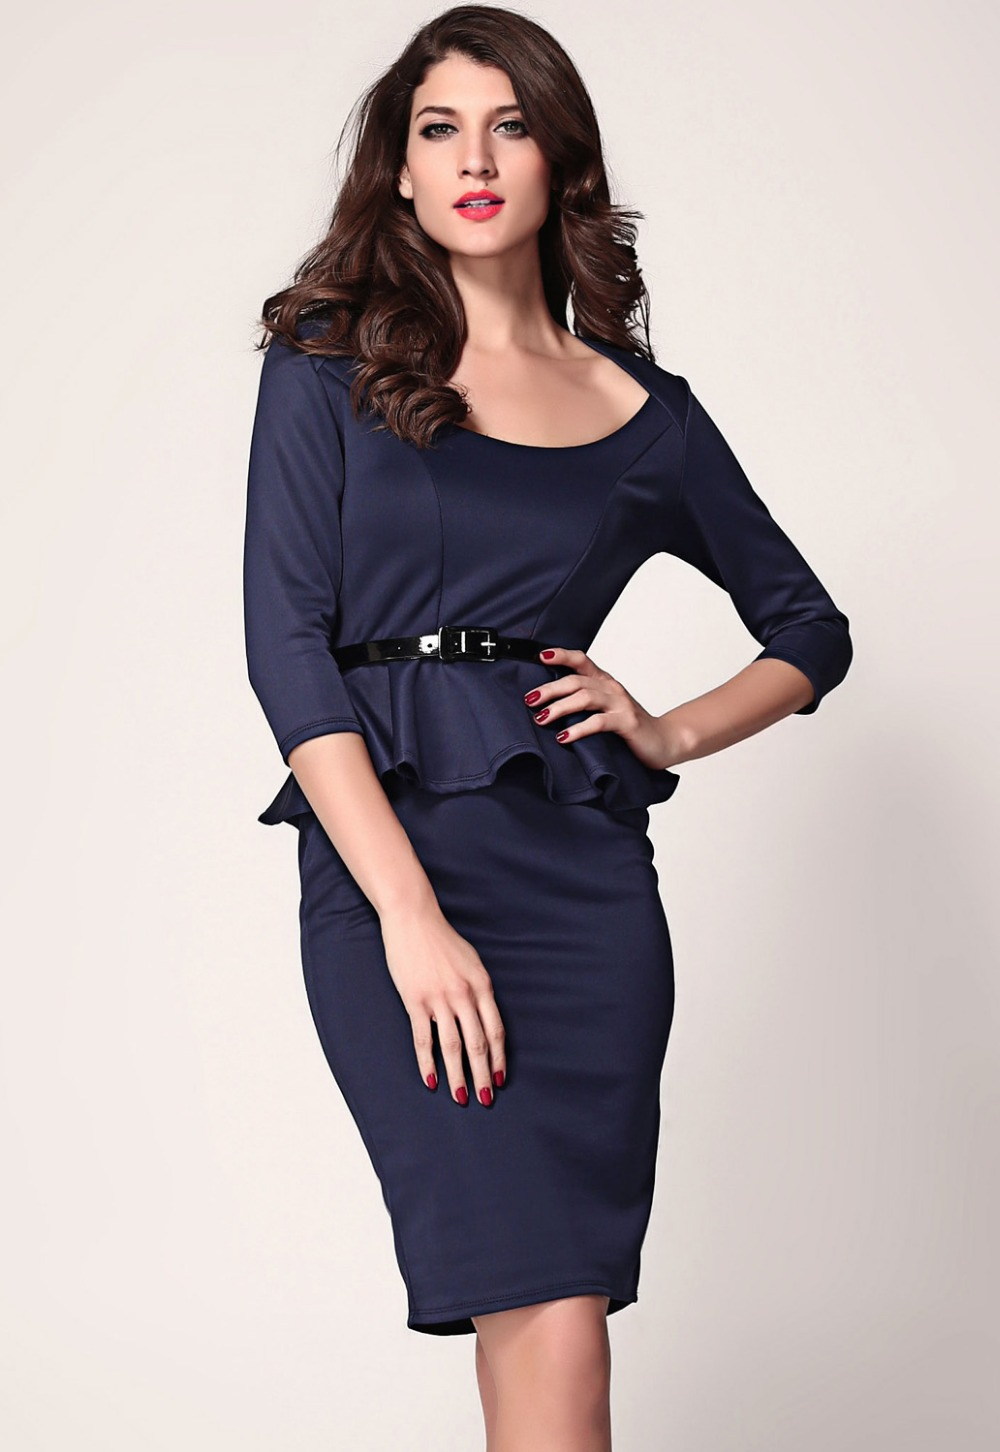 Plus Size Peplum Midi Dress Online Fashion Review